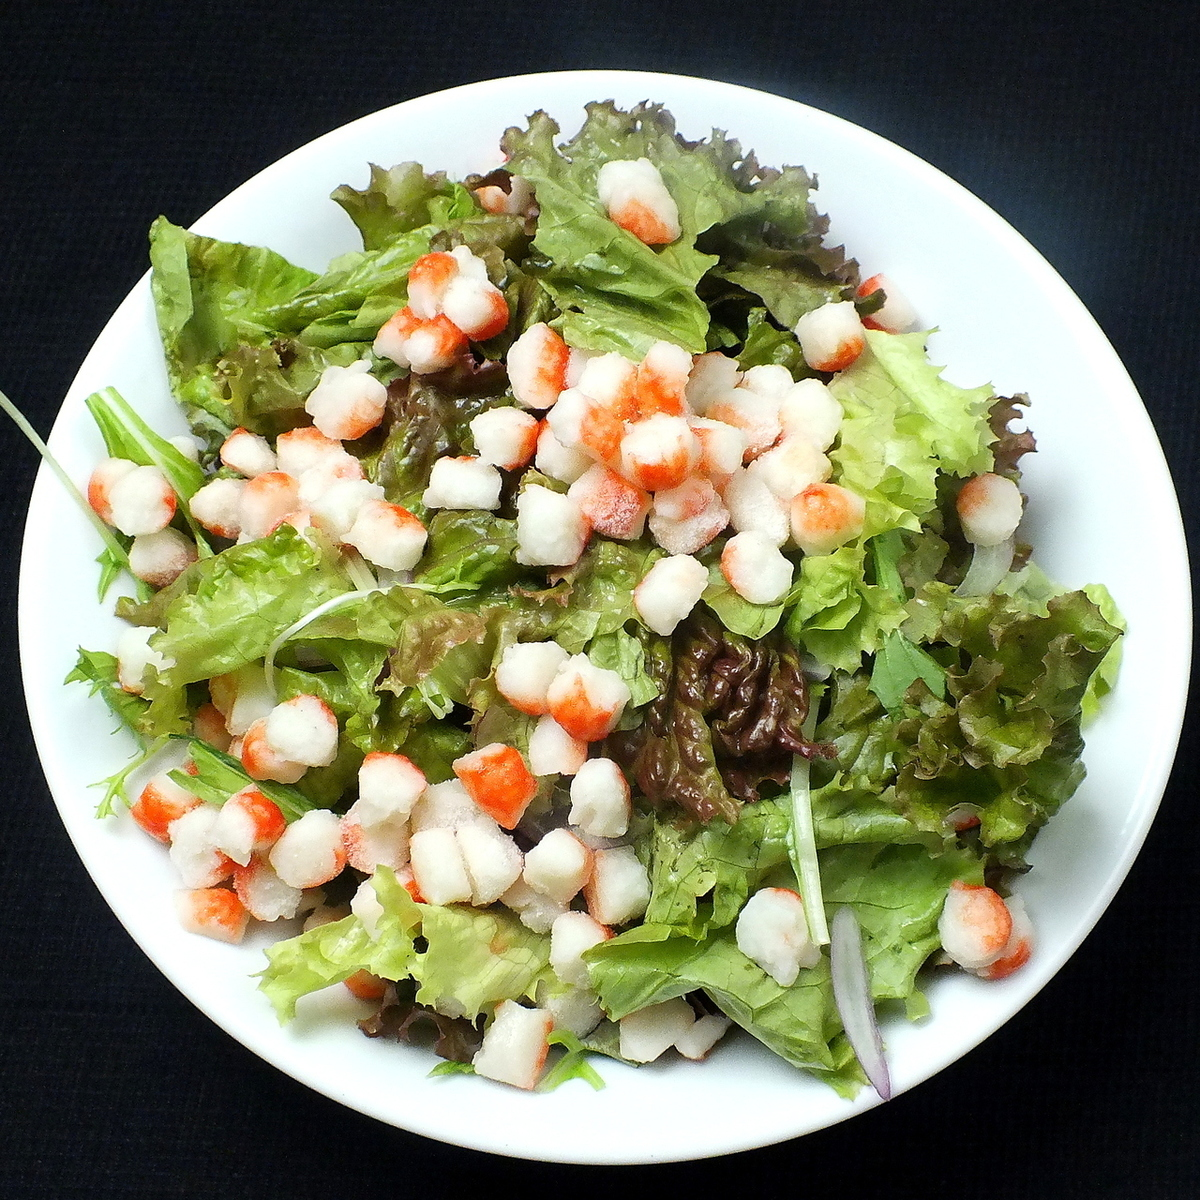 Crab salad with crab